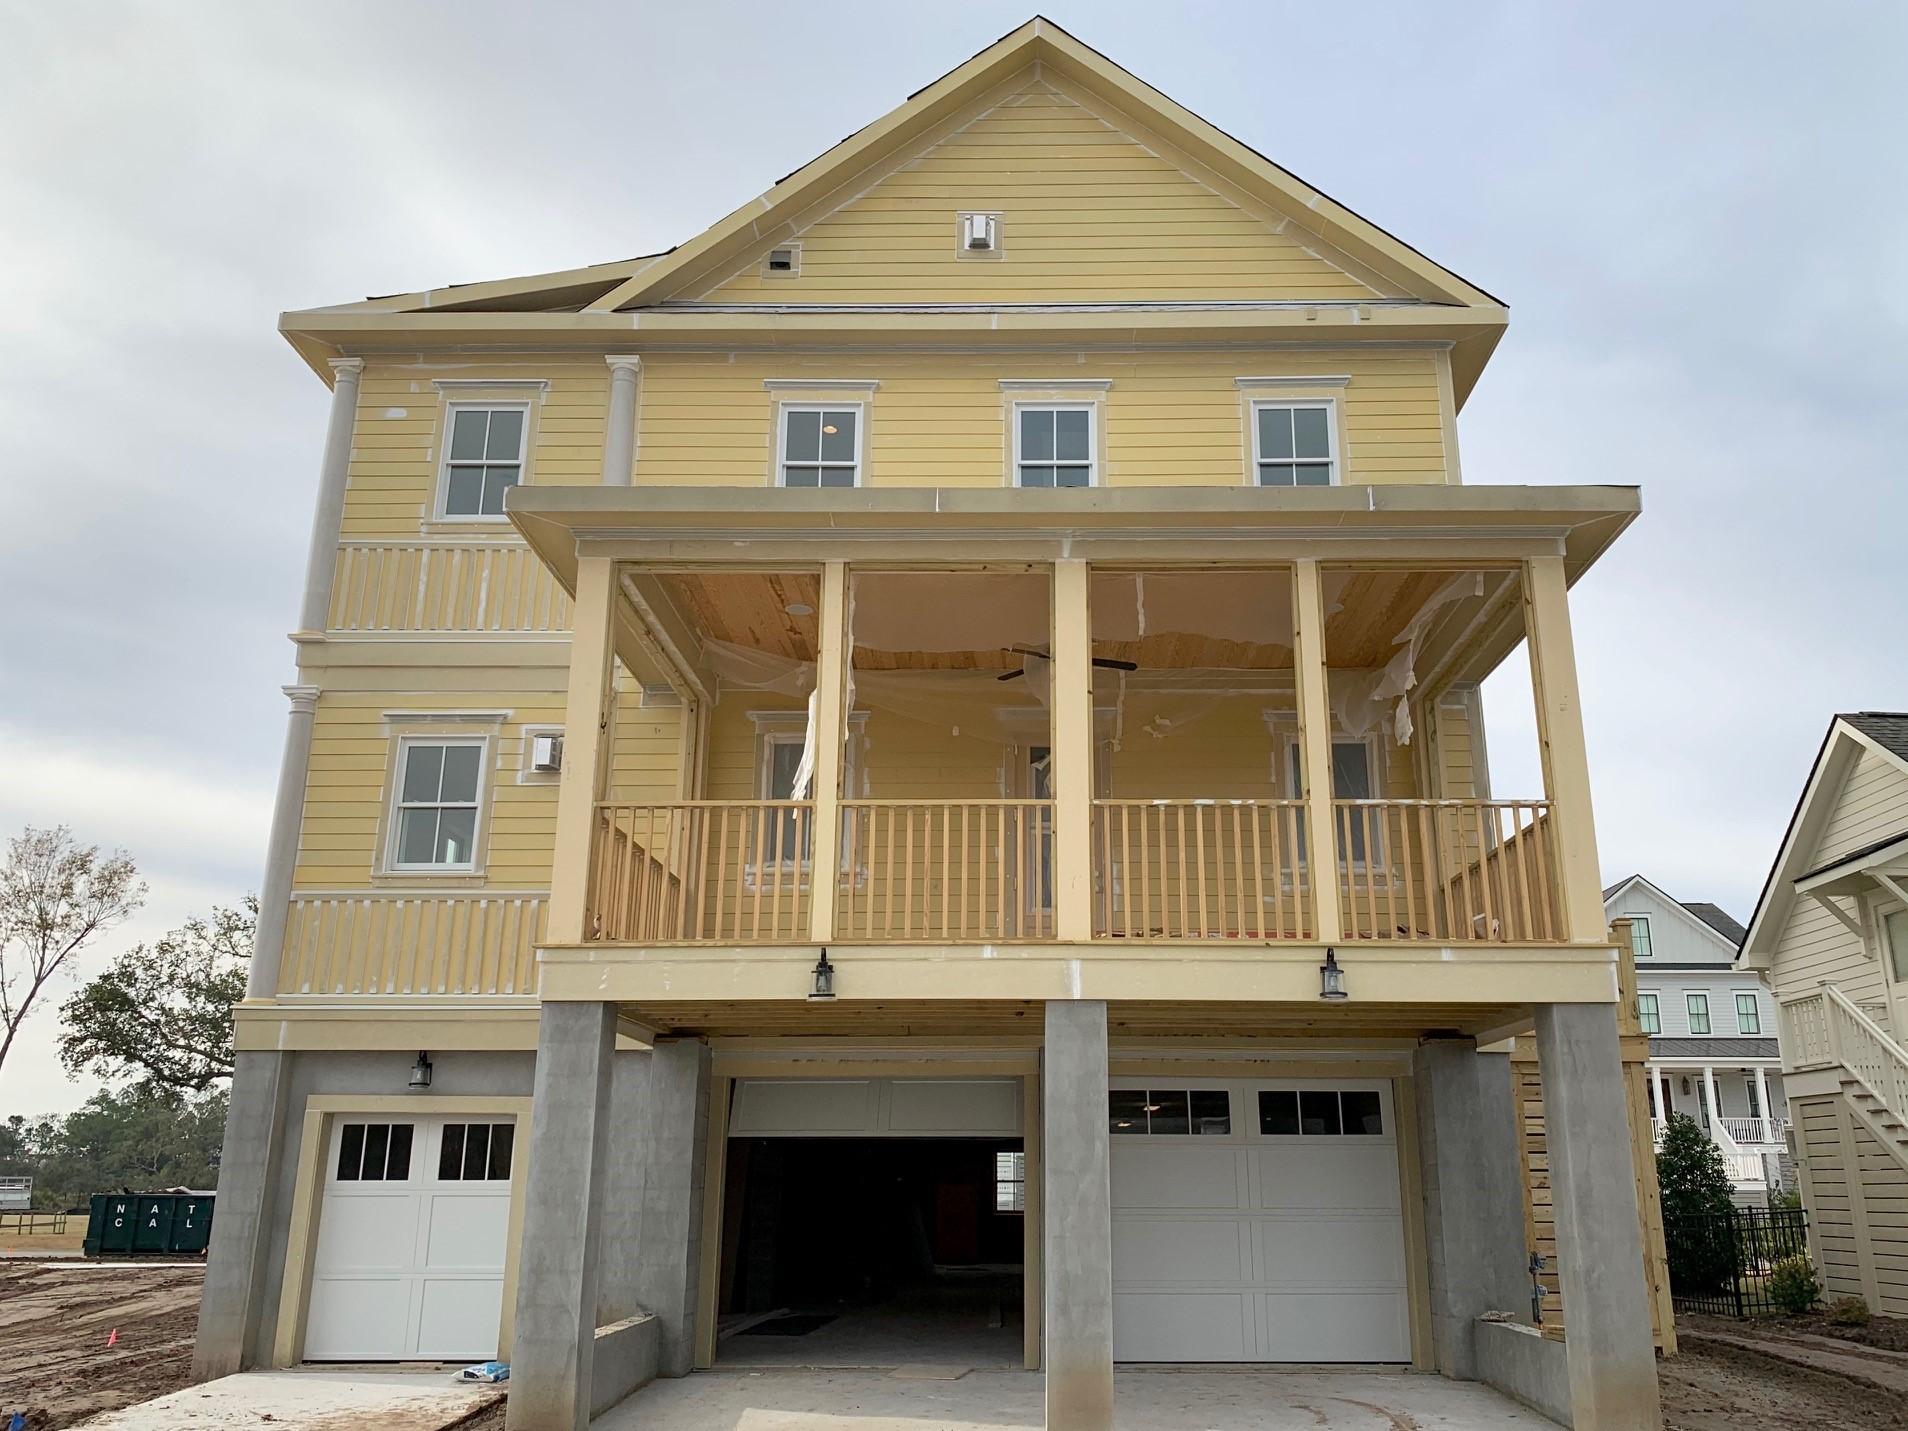 Daniel Island Homes For Sale - 206 Foundry, Charleston, SC - 8